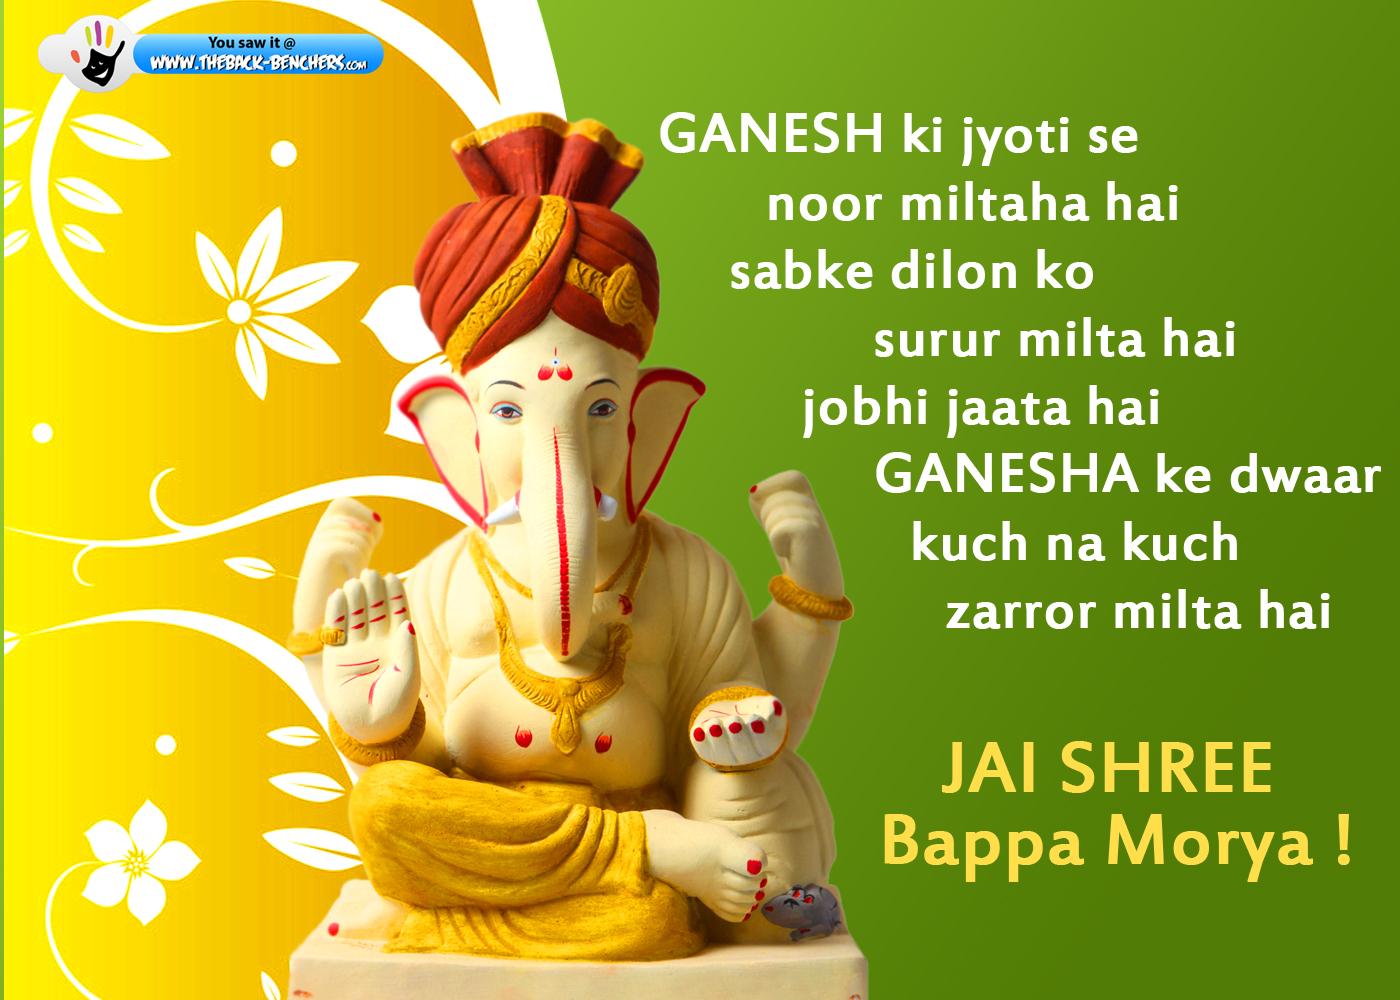 festival ganesh chaturthi in marathi We have provided whatsapp status in marathi, marathi status for love, marathi sad status, marathi status love, ganesh chaturthi whatsapp status in marathi.